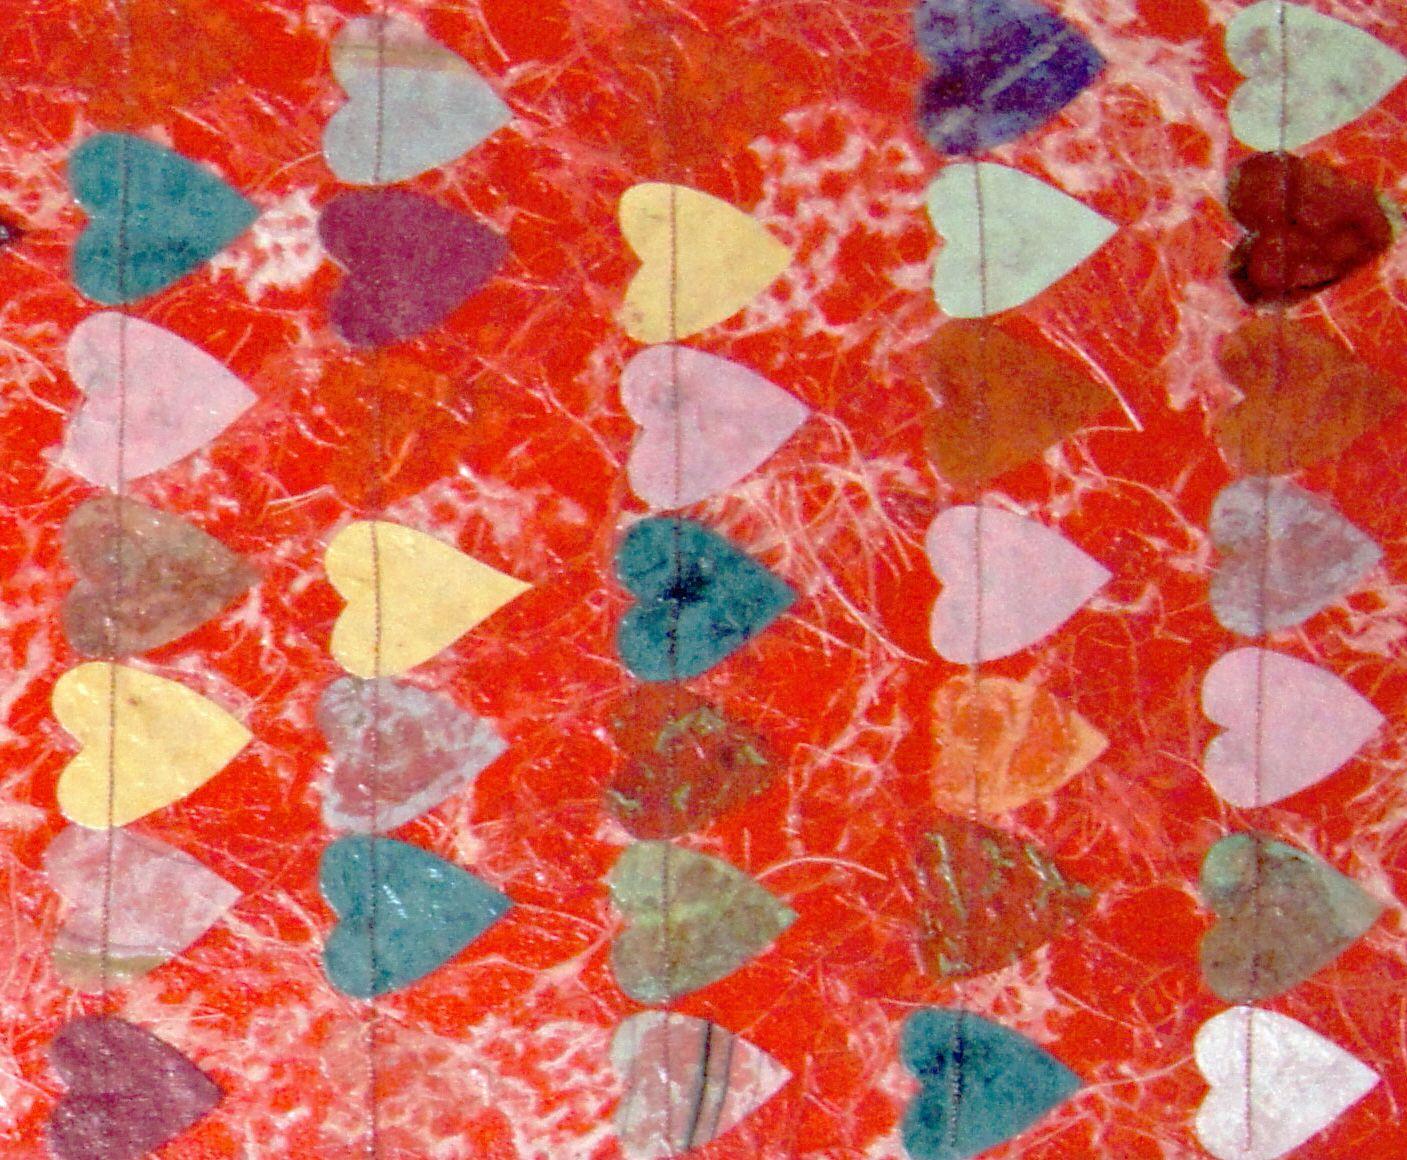 Paper Hearts - www.artfulgift.com